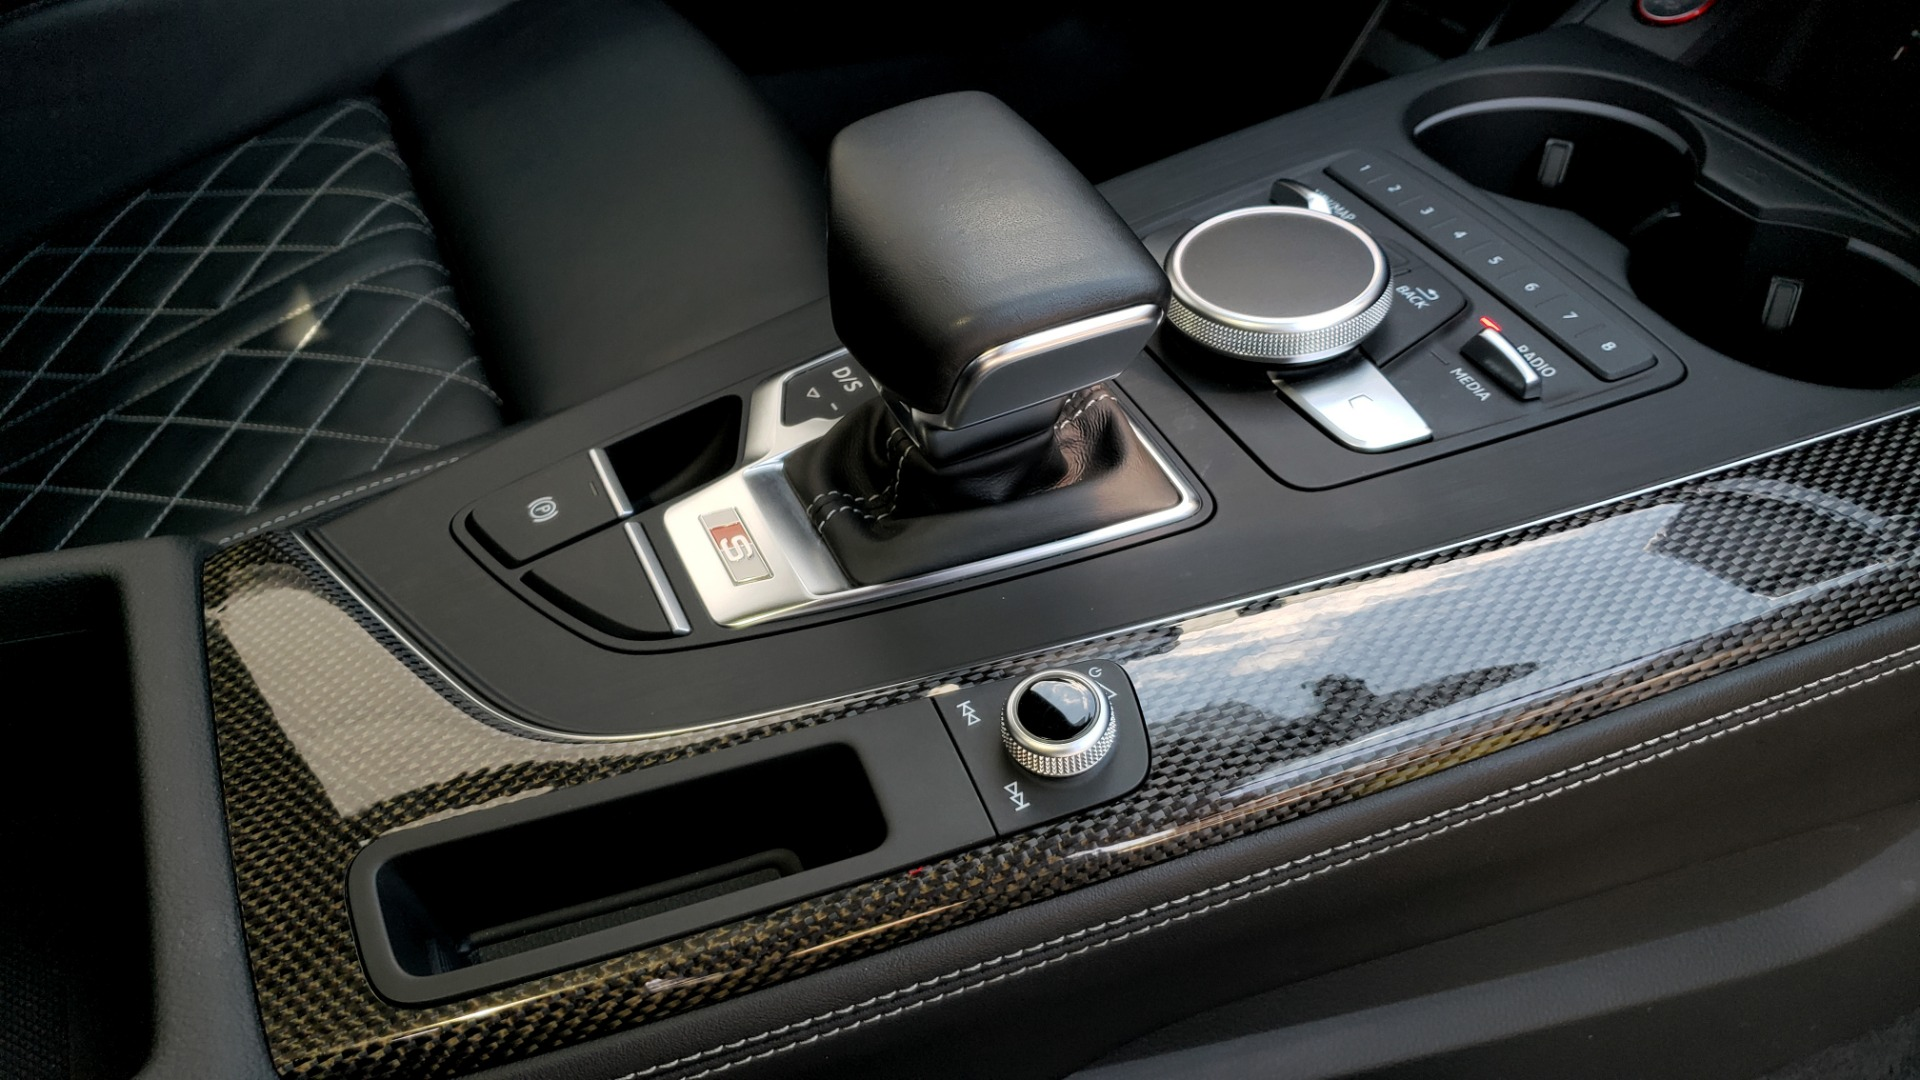 Used 2018 Audi S5 SPORTBACK PRESTIGE S-SPORT / NAV / SUNROOF / HUD / B&O SND / REARVIEW for sale $48,995 at Formula Imports in Charlotte NC 28227 70